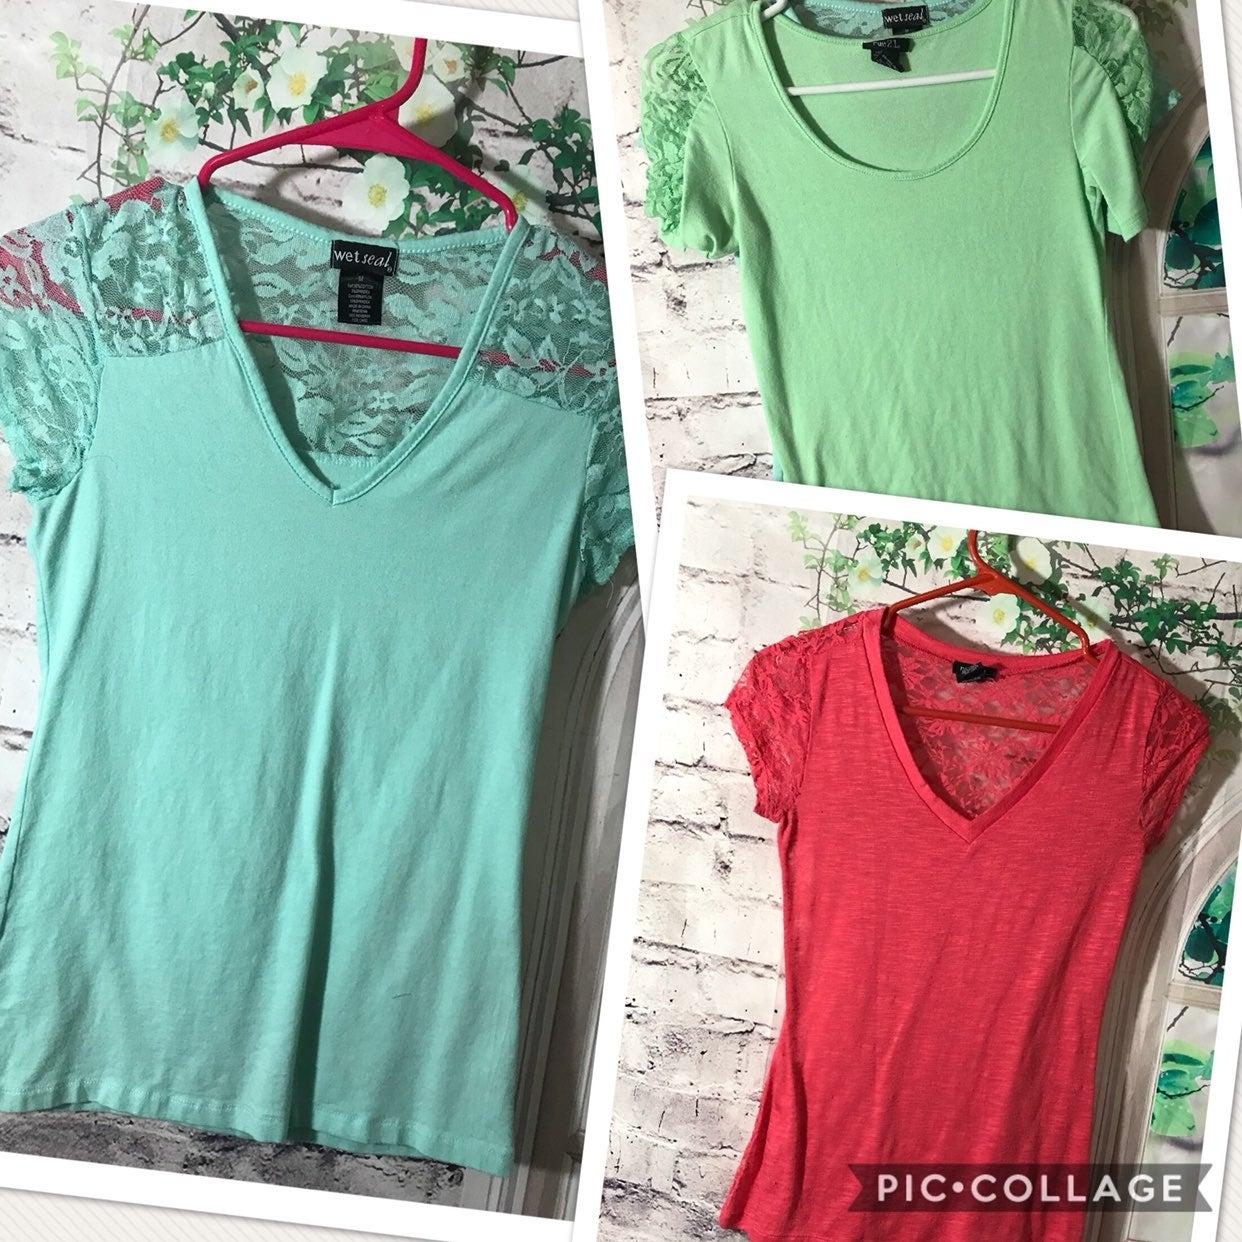 3-Small/Medium Shirts From Wet Seal